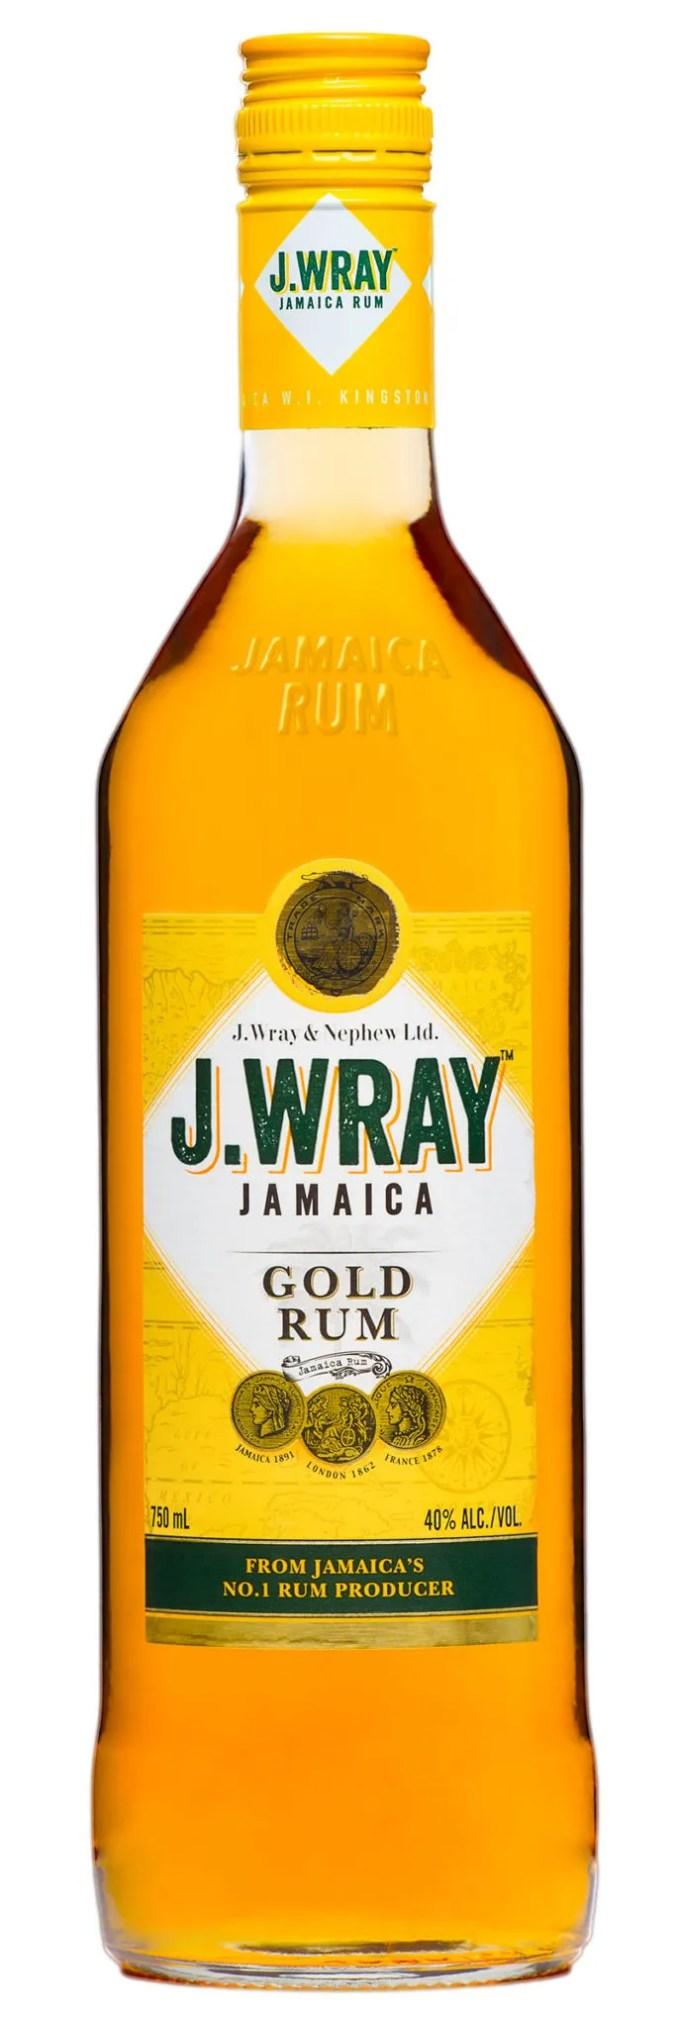 J.Wray Jamaica Rum Gold